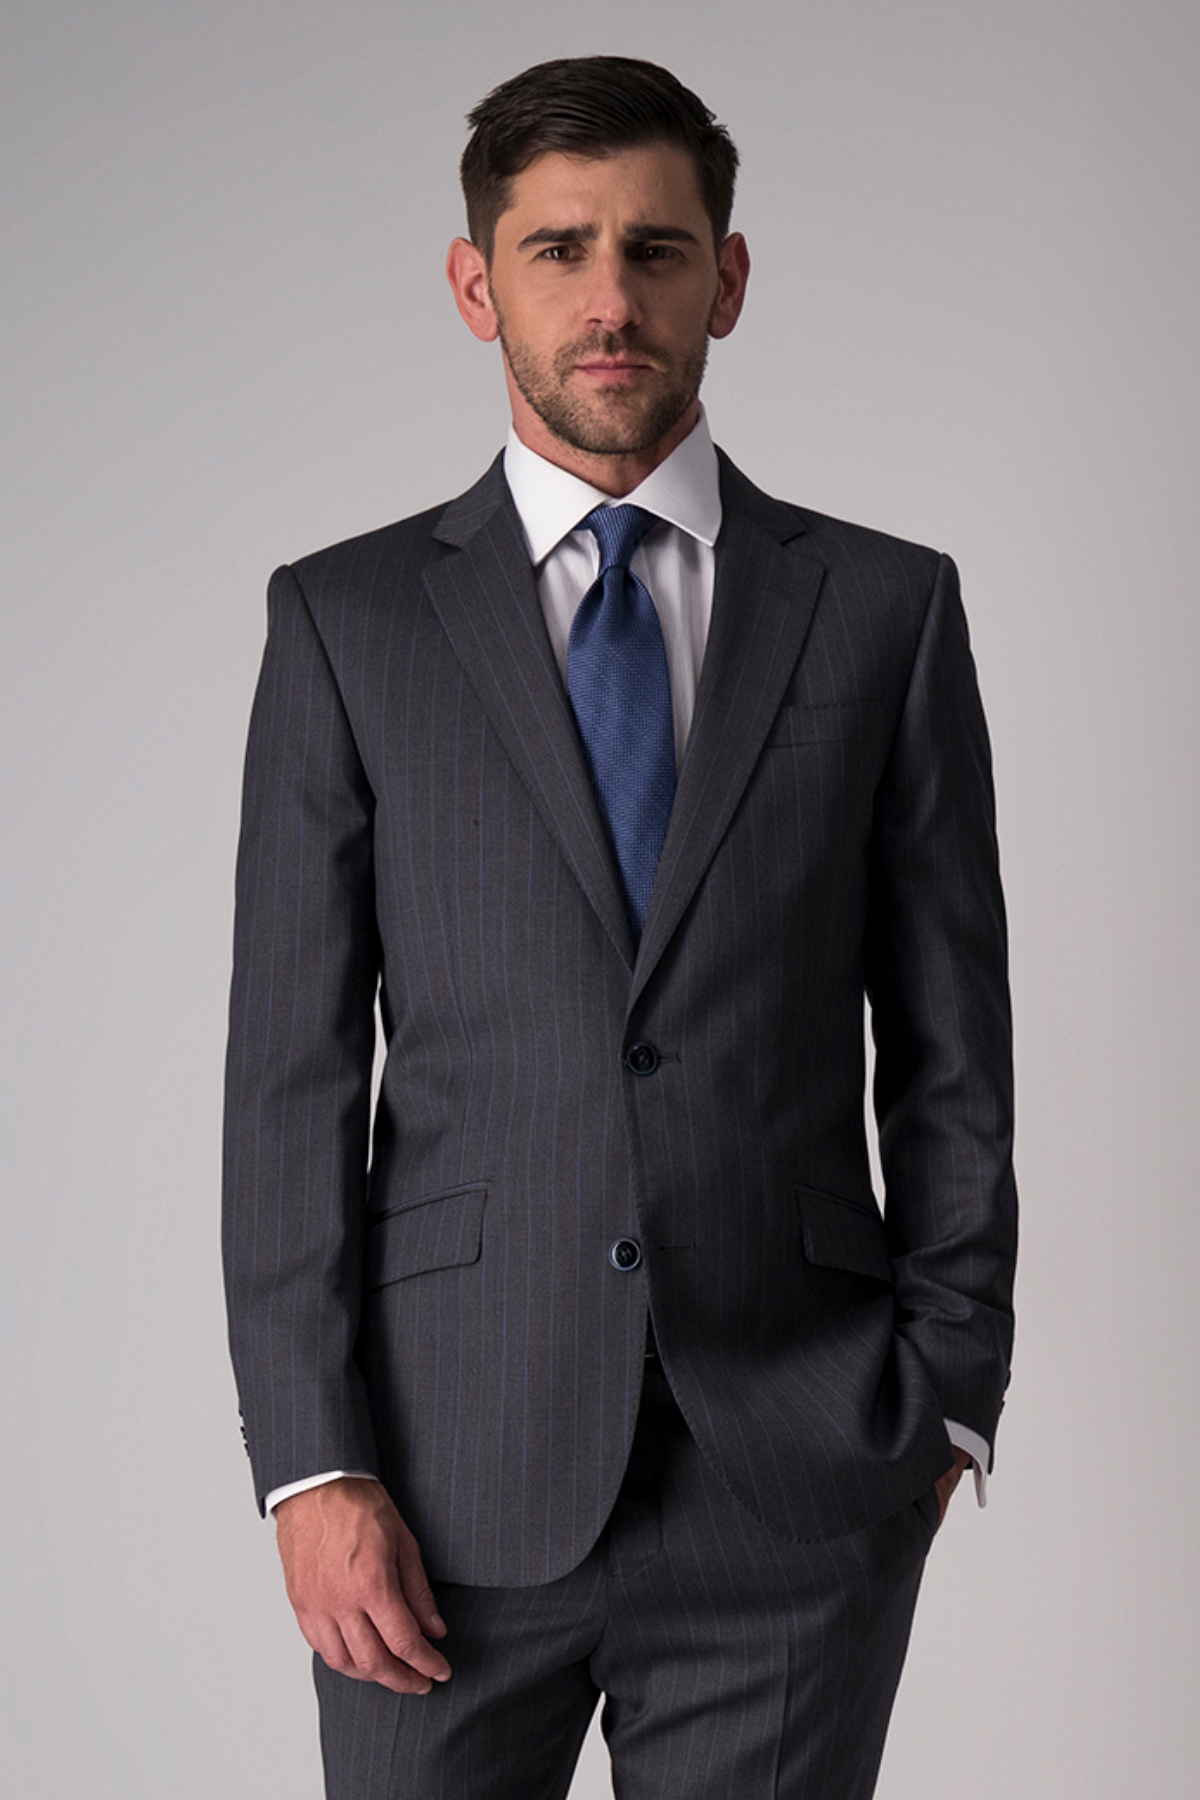 Traje Robert´s, 100% lana, slim fit, gris oxford a rayas.